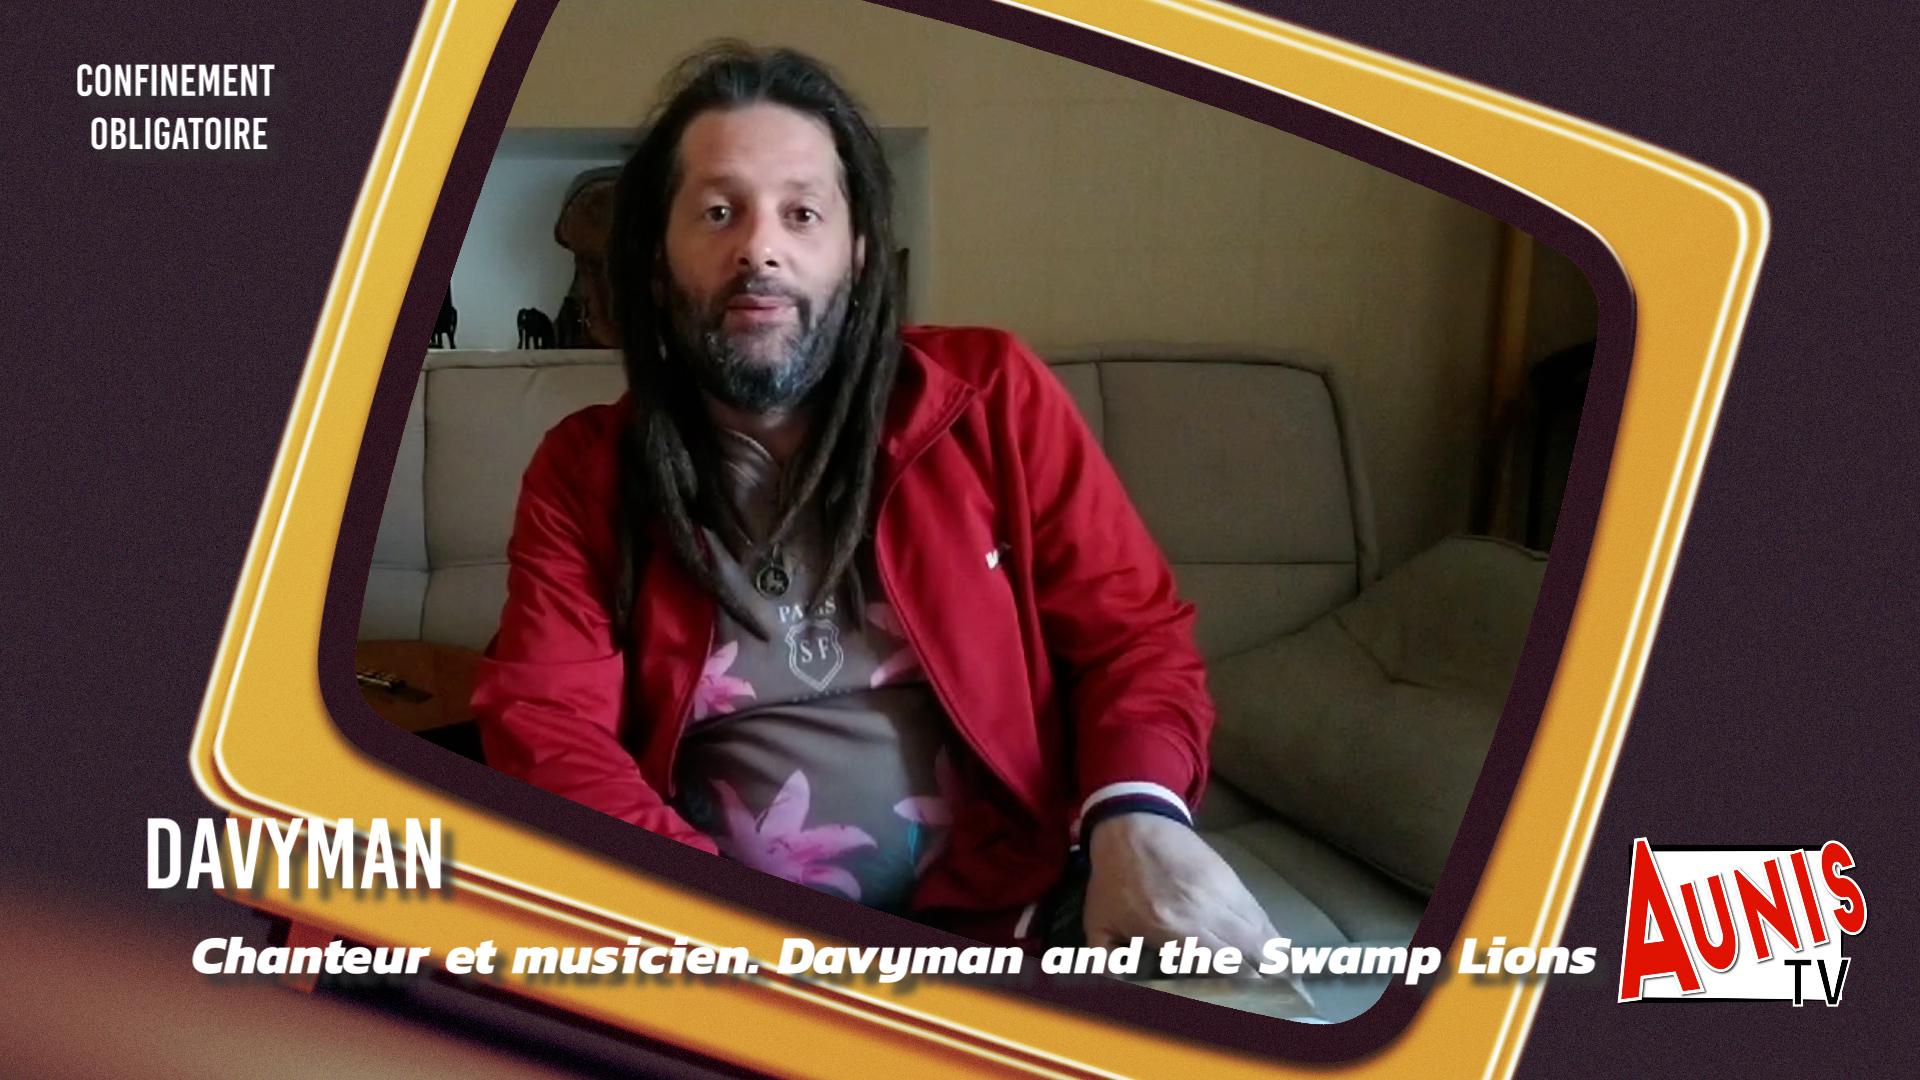 Davyman Confinement obligatoire swamp lions